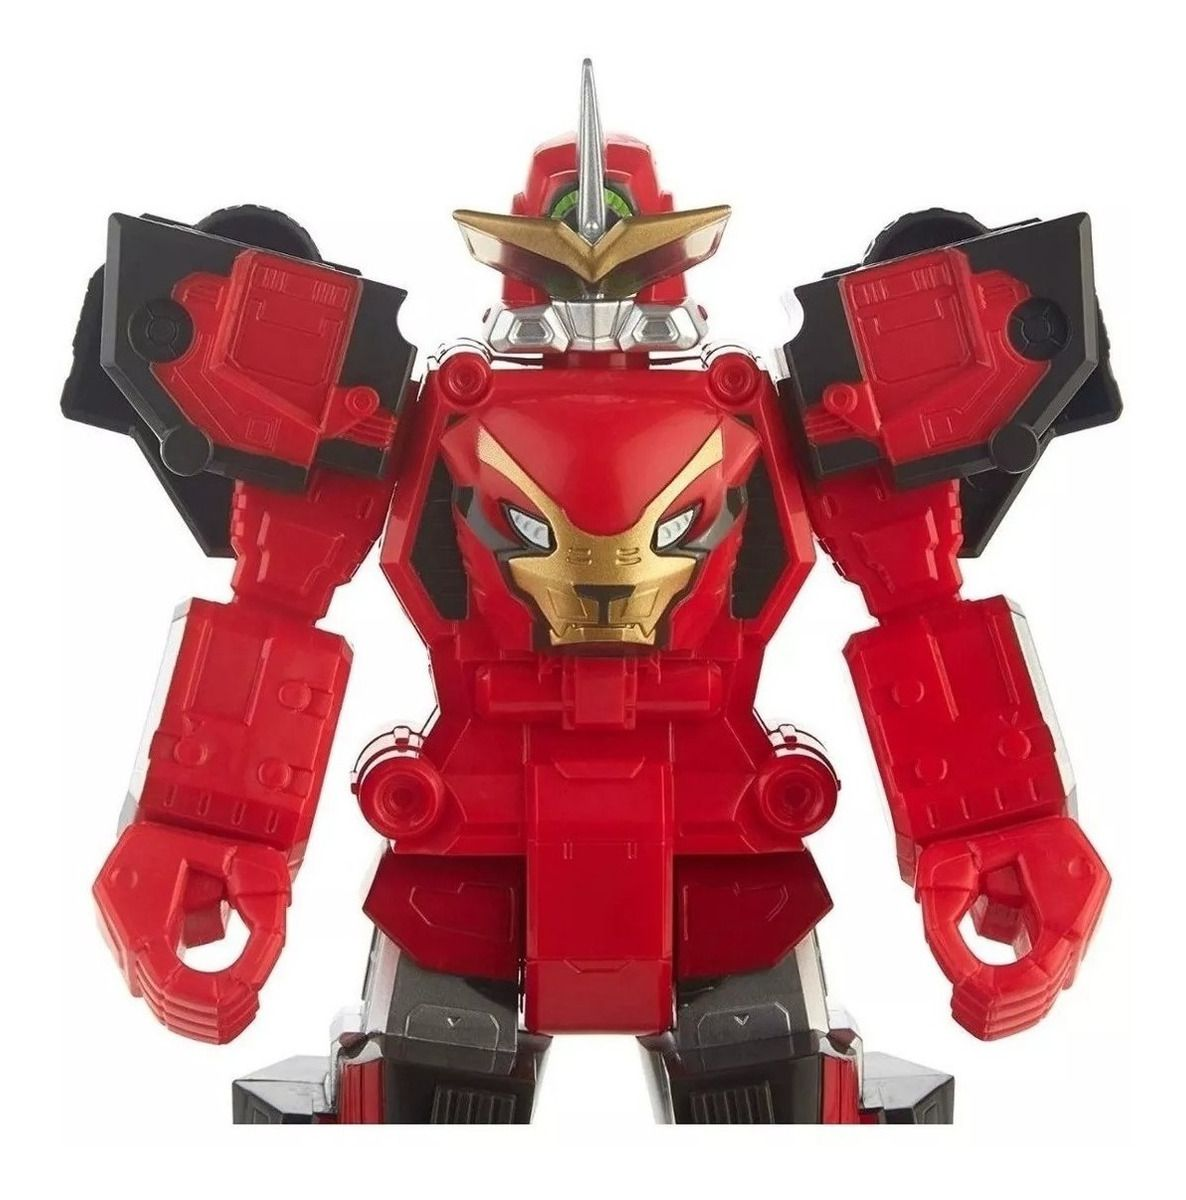 Boneco Megazord Power Rangers Vermelho 30cm - Hasbro E5900